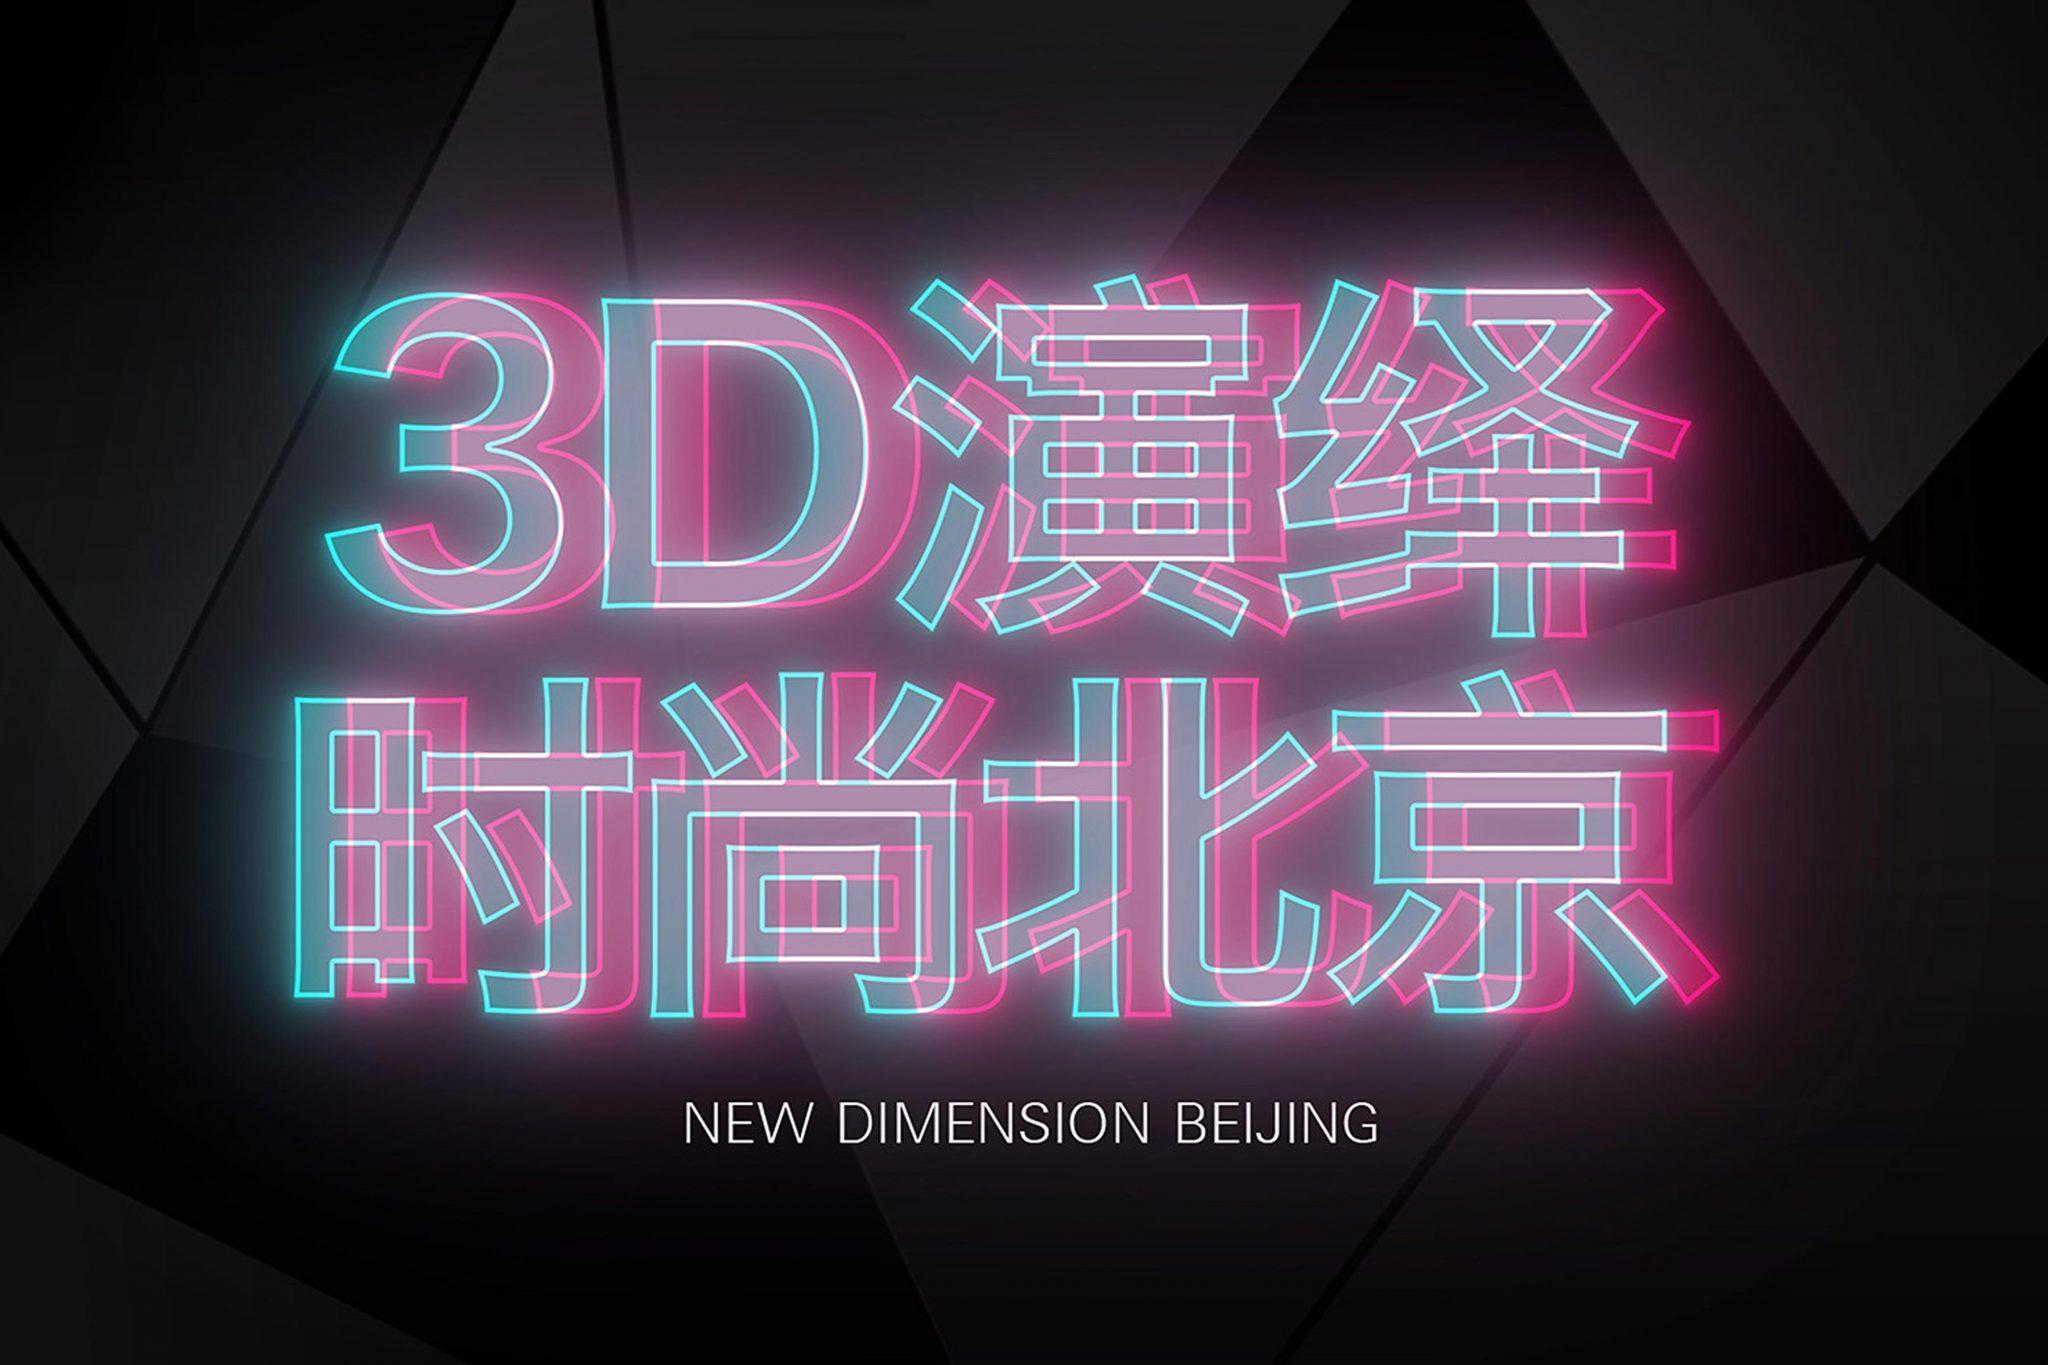 New Dimension Beijing 3D